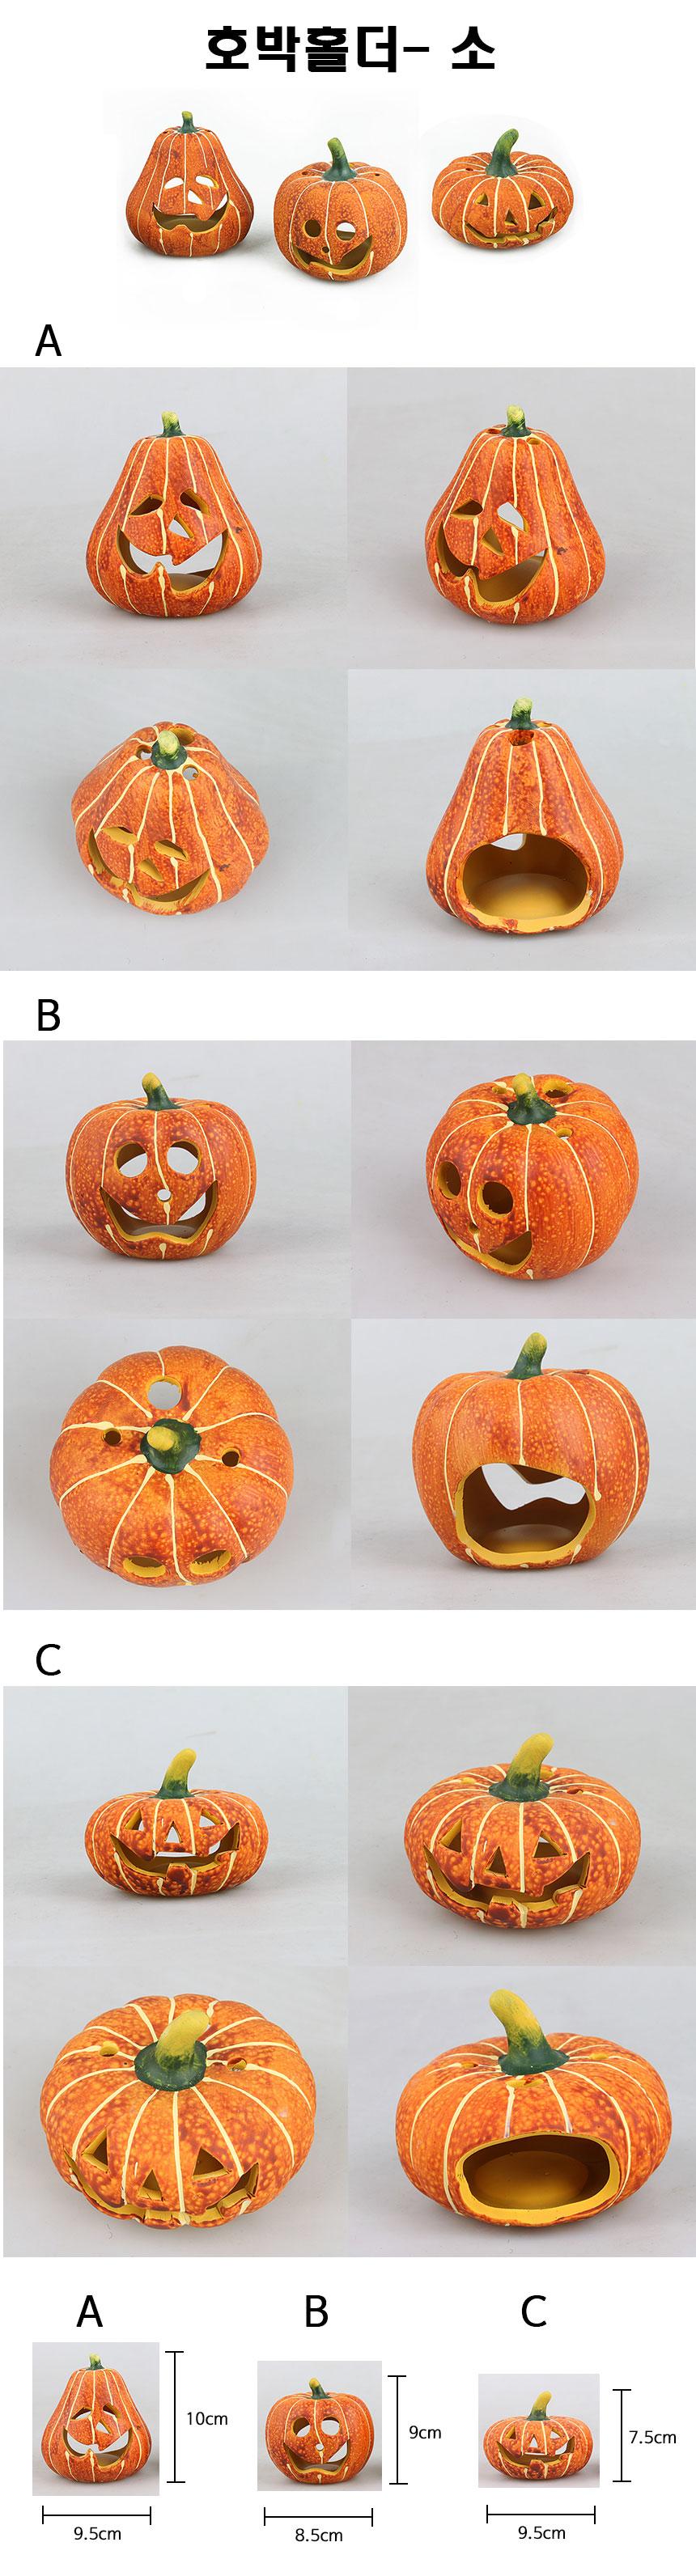 http://partyb2b.mireene.kr/img/party/Halloween/pumpkinholder2Small.jpg